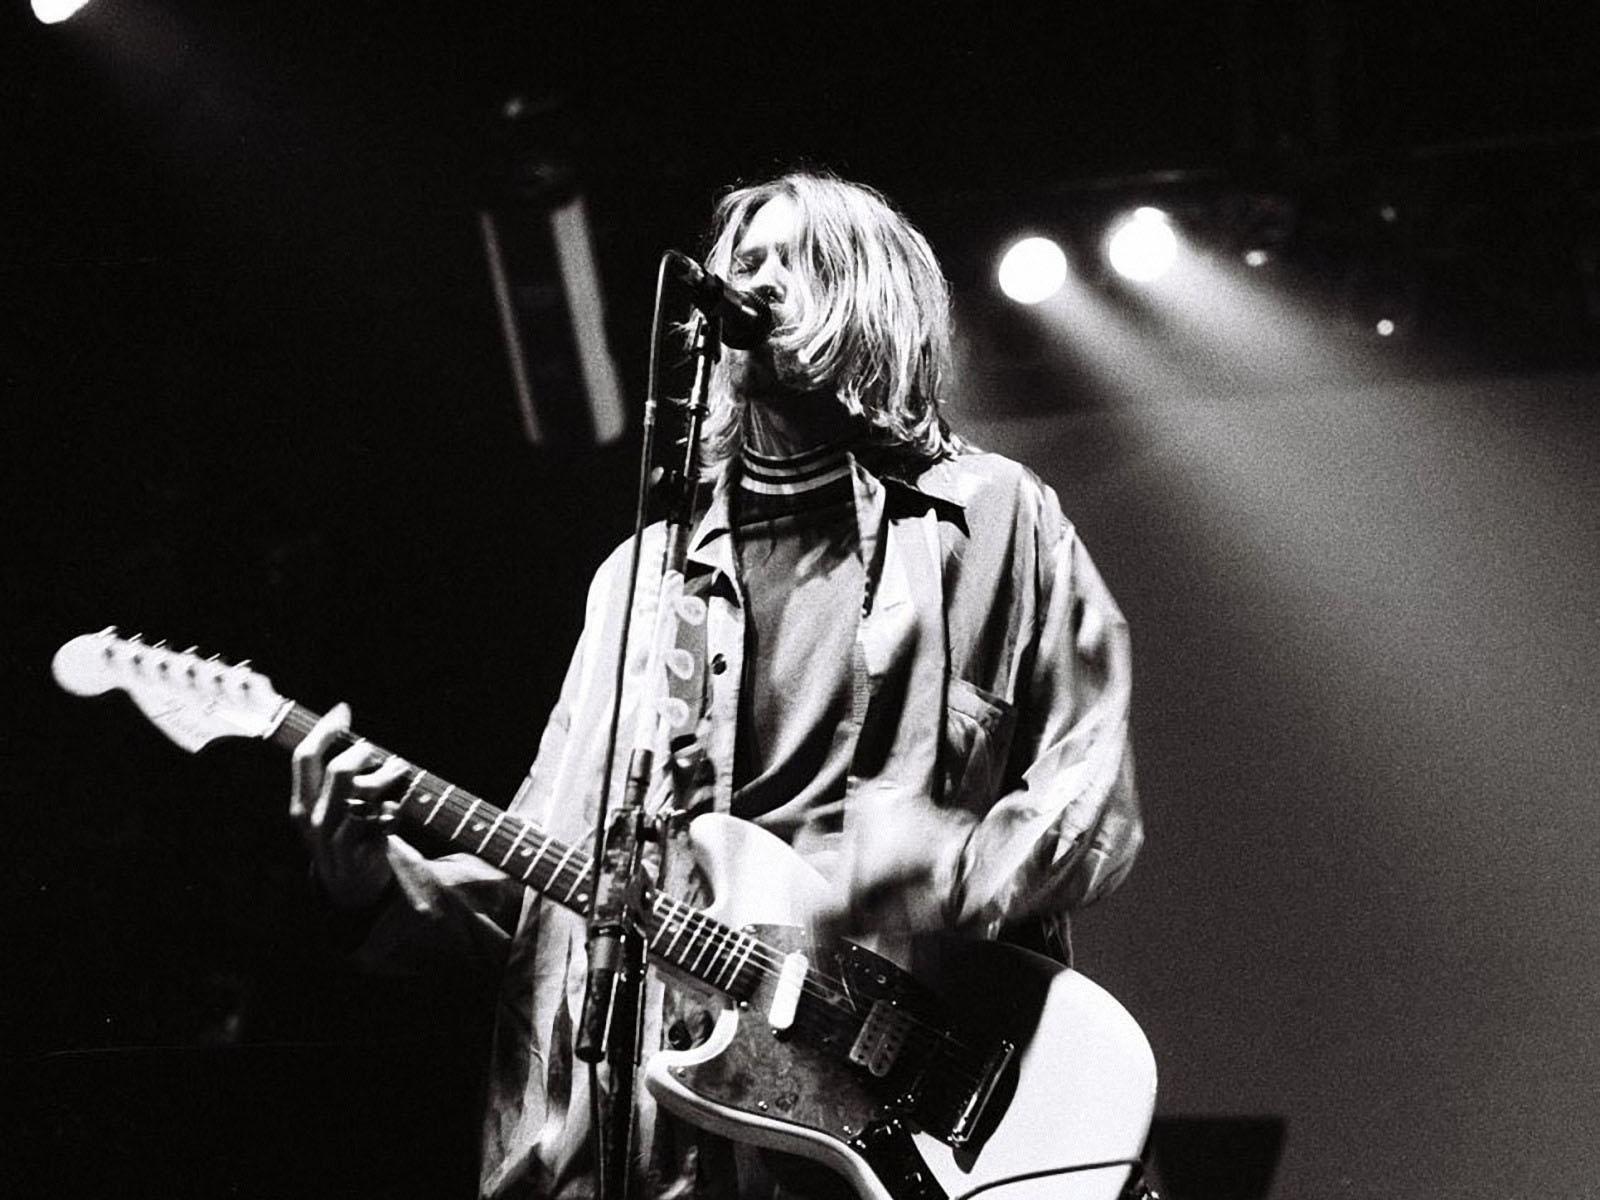 Kurt Cobain Wallpaper Nirvana The Person Listening Desktop 1600 1200 Kurt Cobain Wallpaper 43 Wallpapers Adorable W Nirvana Music Nirvana Wallpaper Nirvana